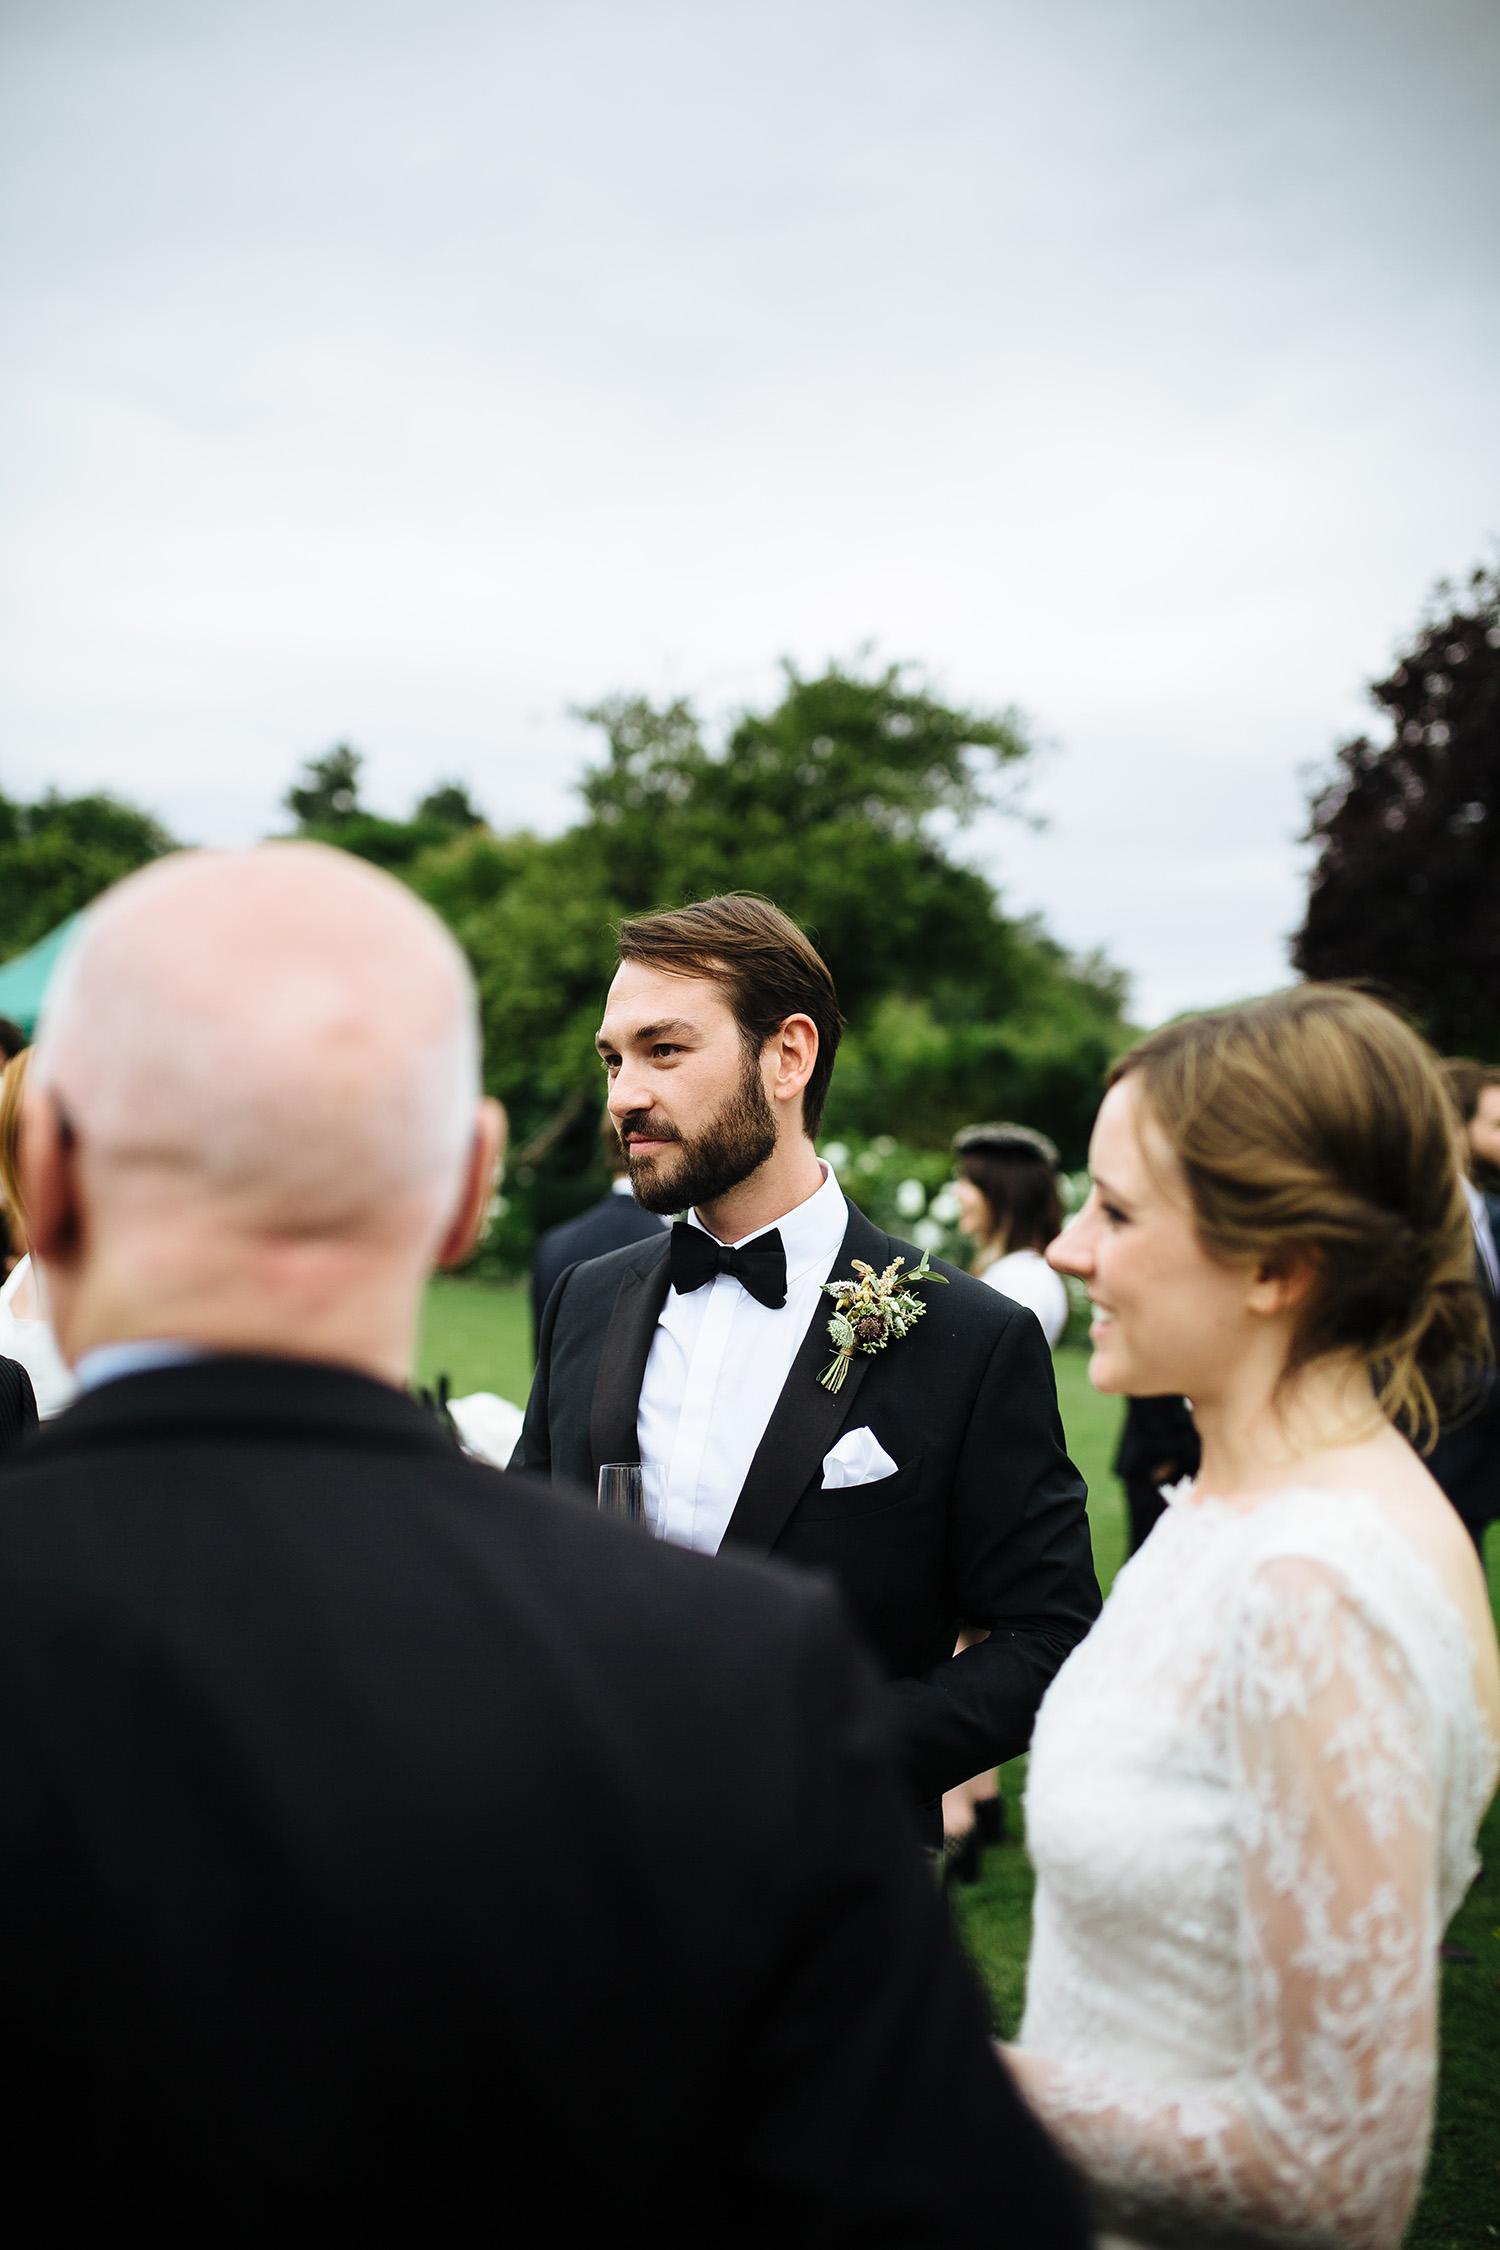 CHILDERLEY HALL CAMBRIDGE WEDDING 67.JPG